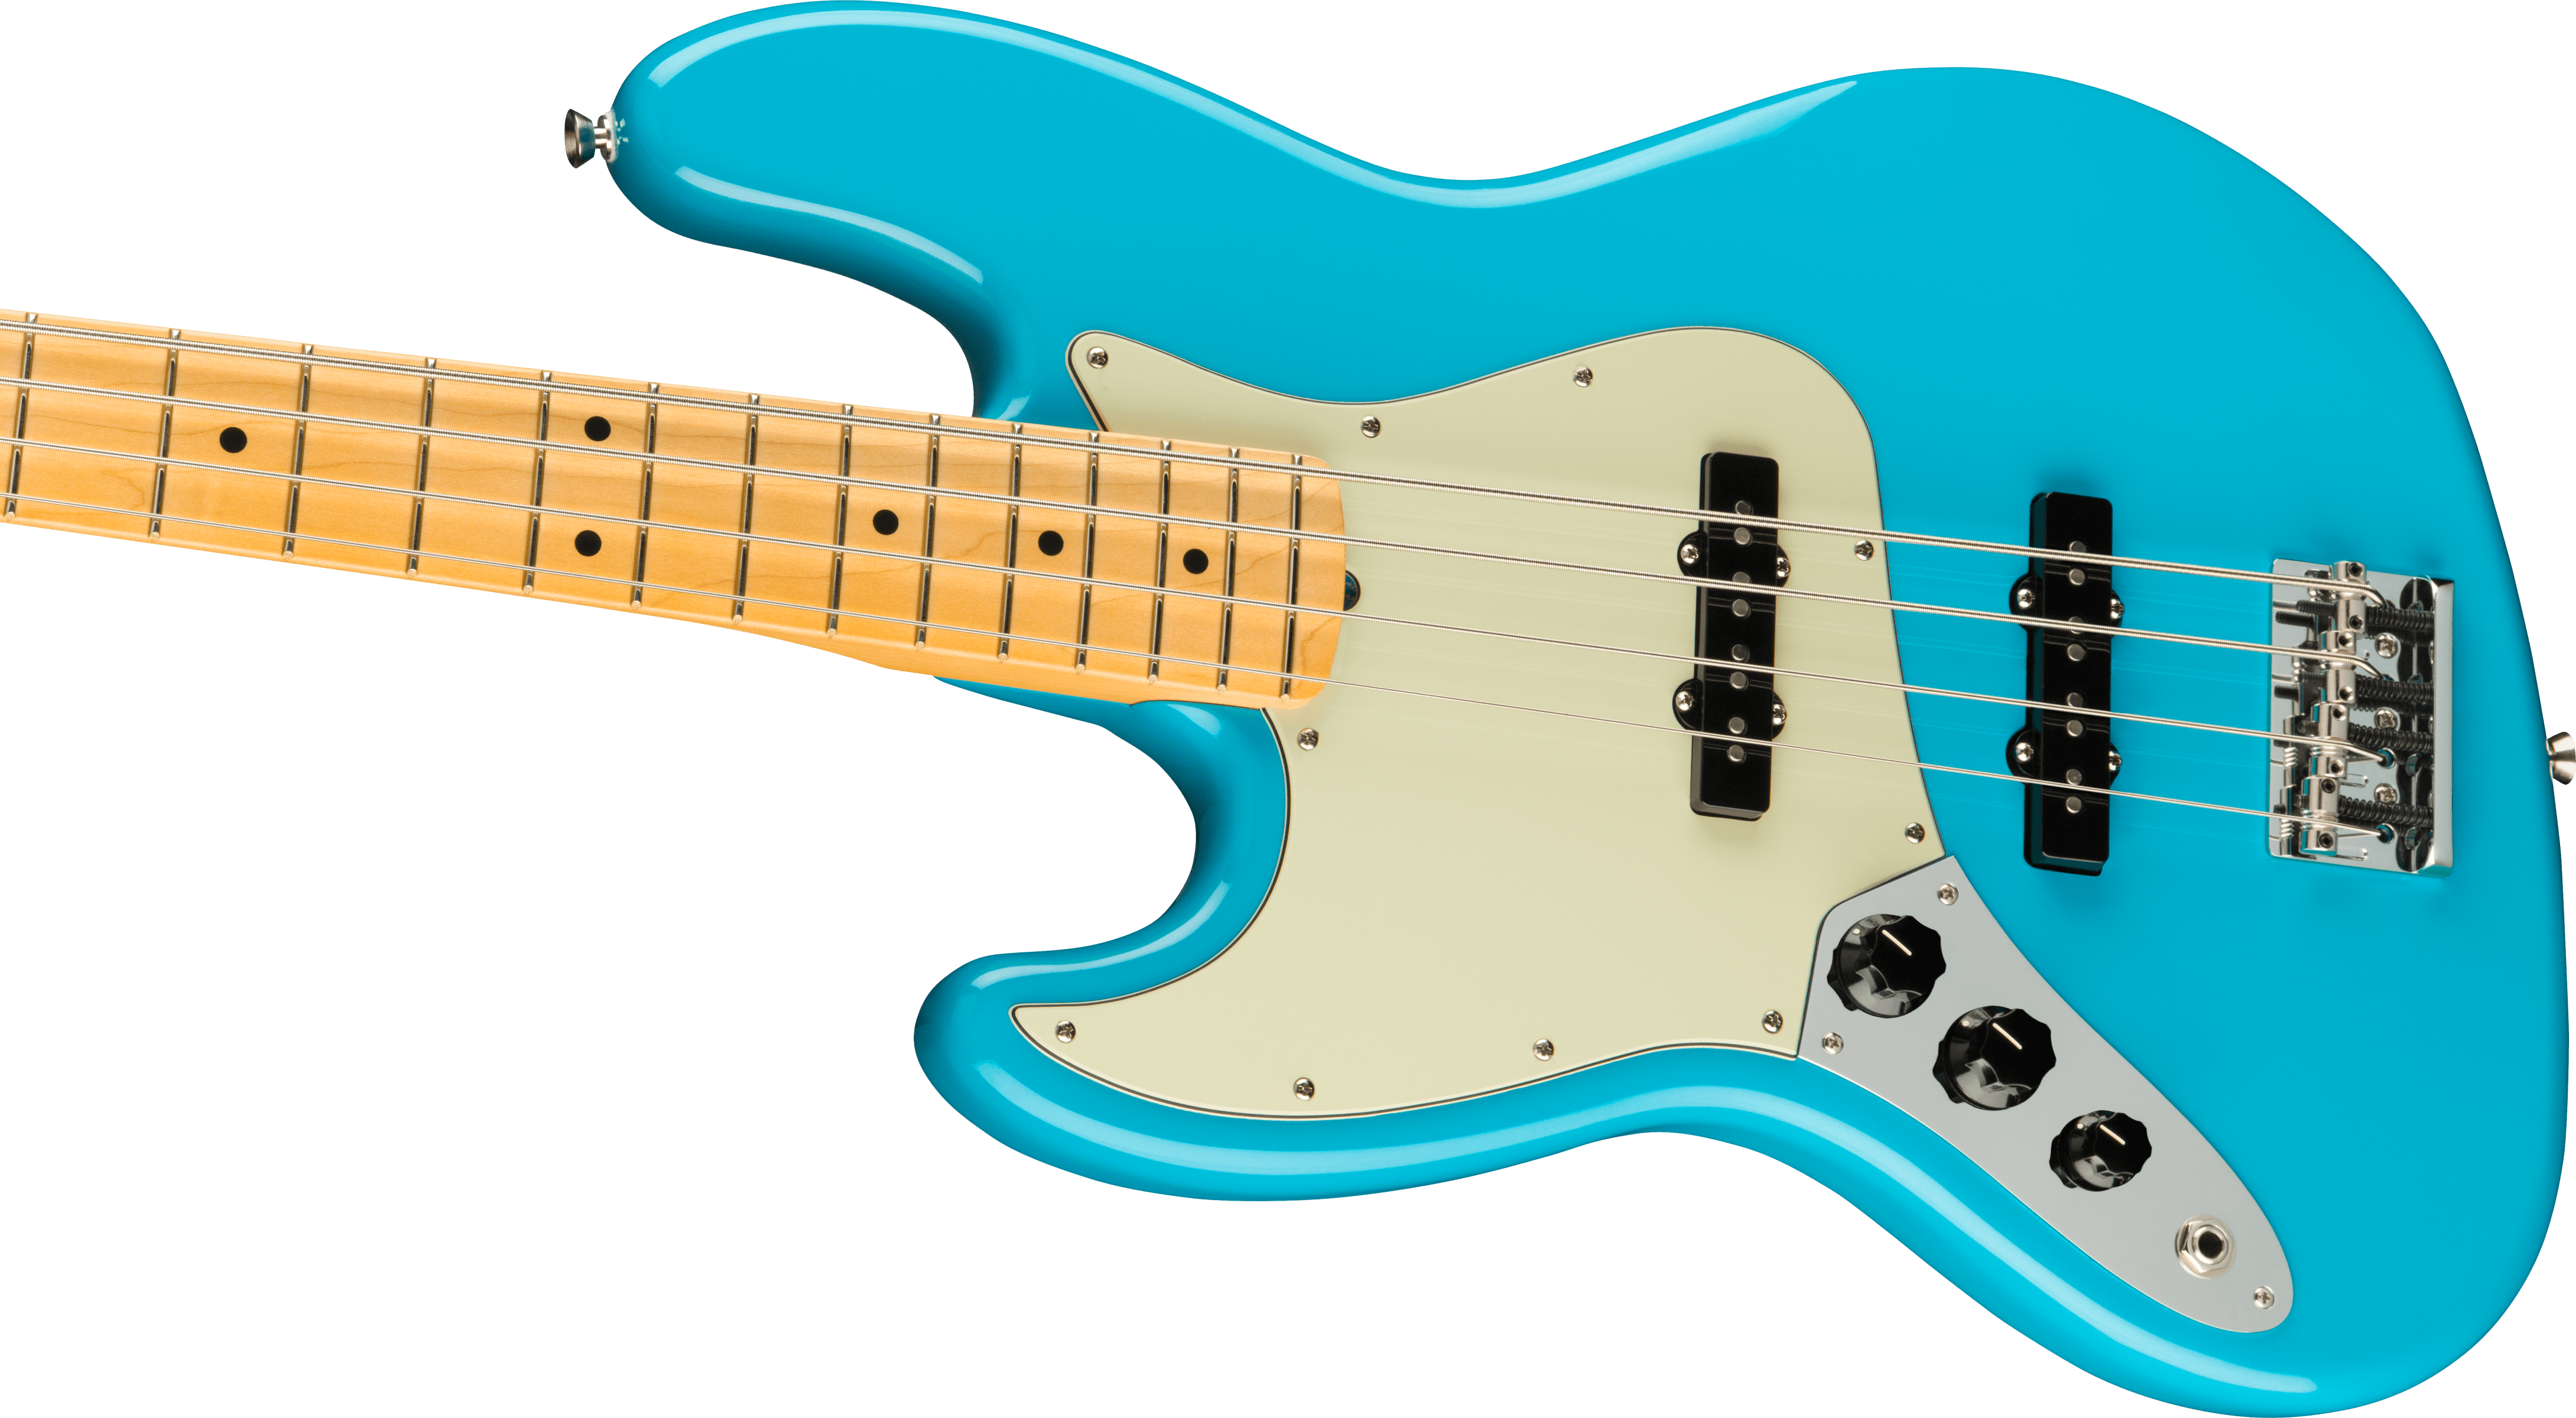 Fender American Professional II Jazz Bass® Left-Hand, Maple Fingerboard, Miami Blue